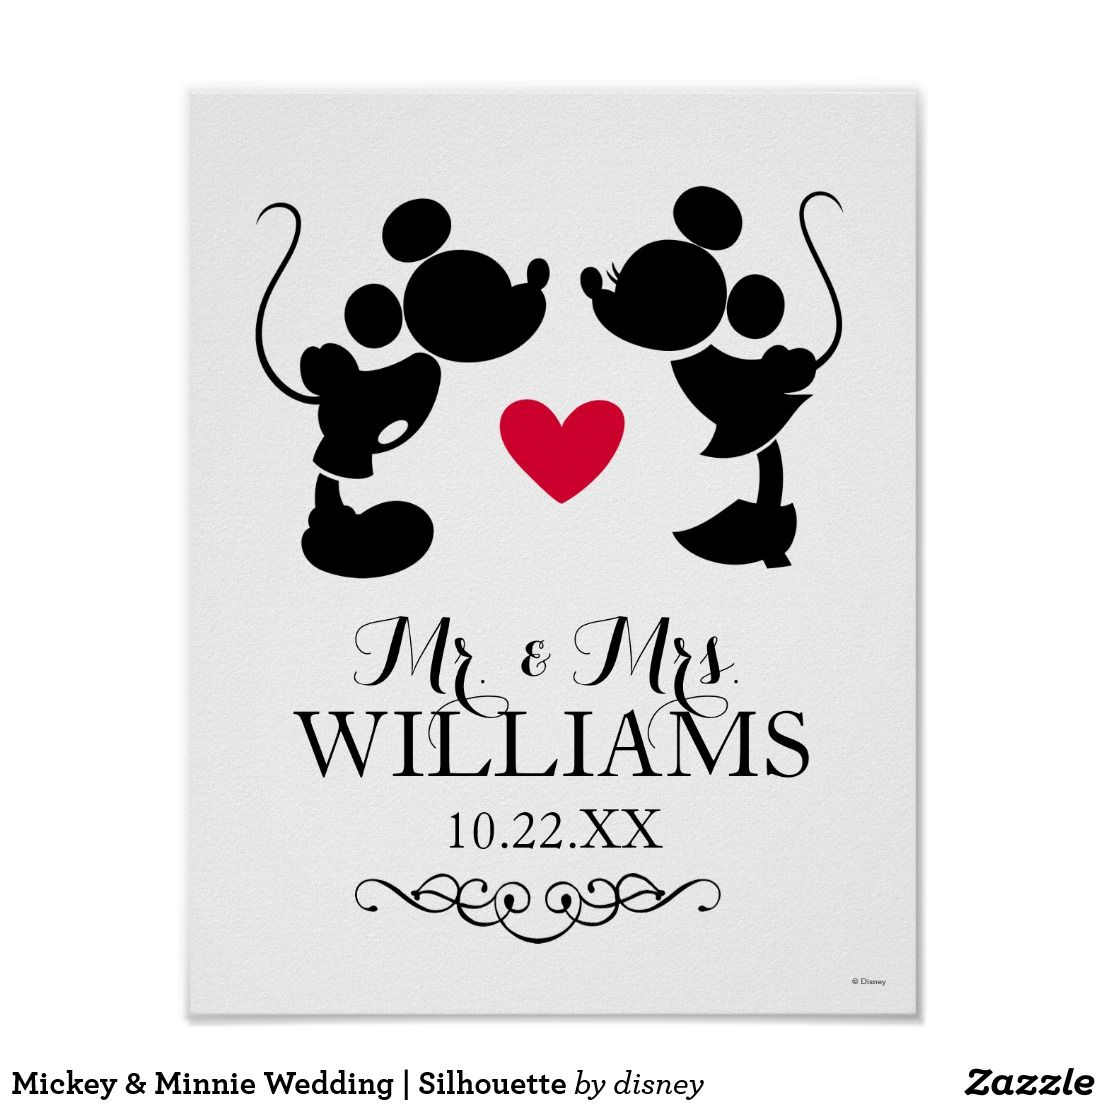 Mickey & Minnie Wedding | Silhouette Poster | Wedding Ideas, Favors ...